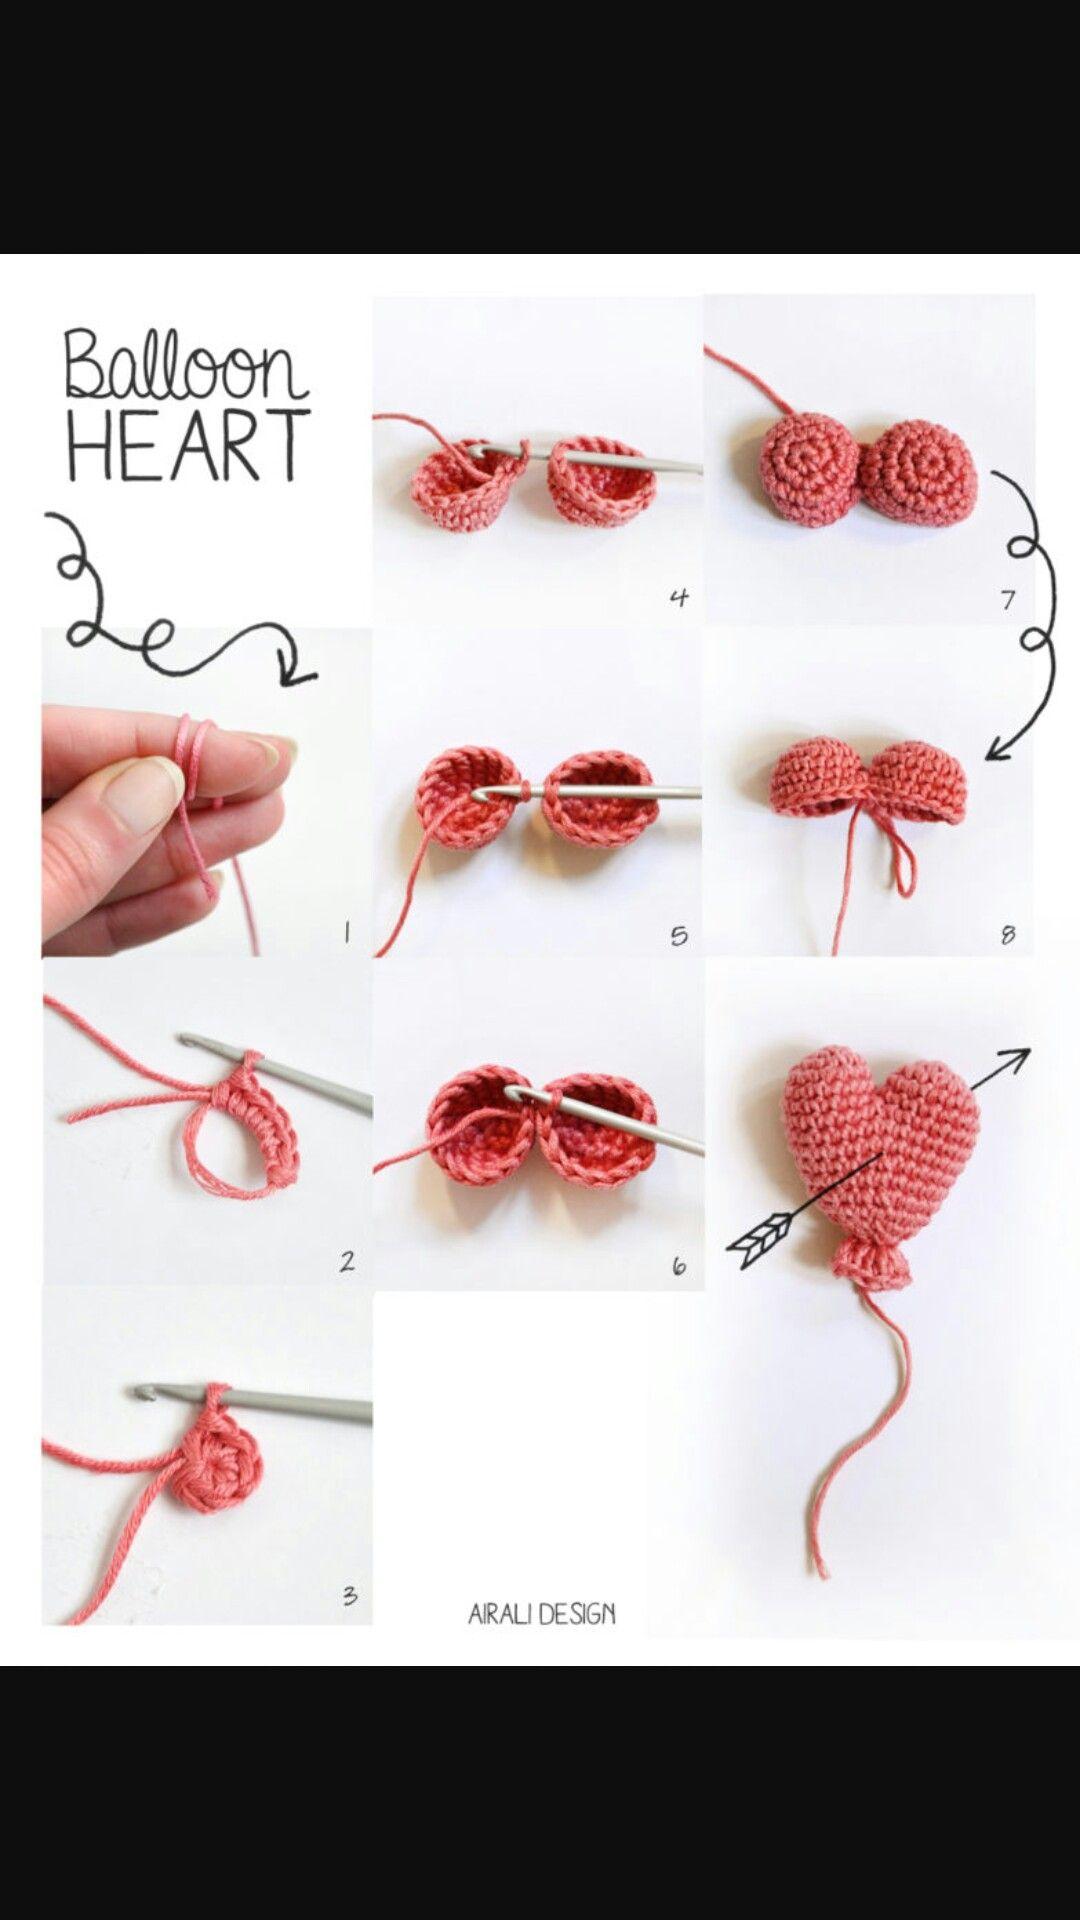 Pin de Mercedes en mamá | Pinterest | Crochet, Crochet patterns y ...